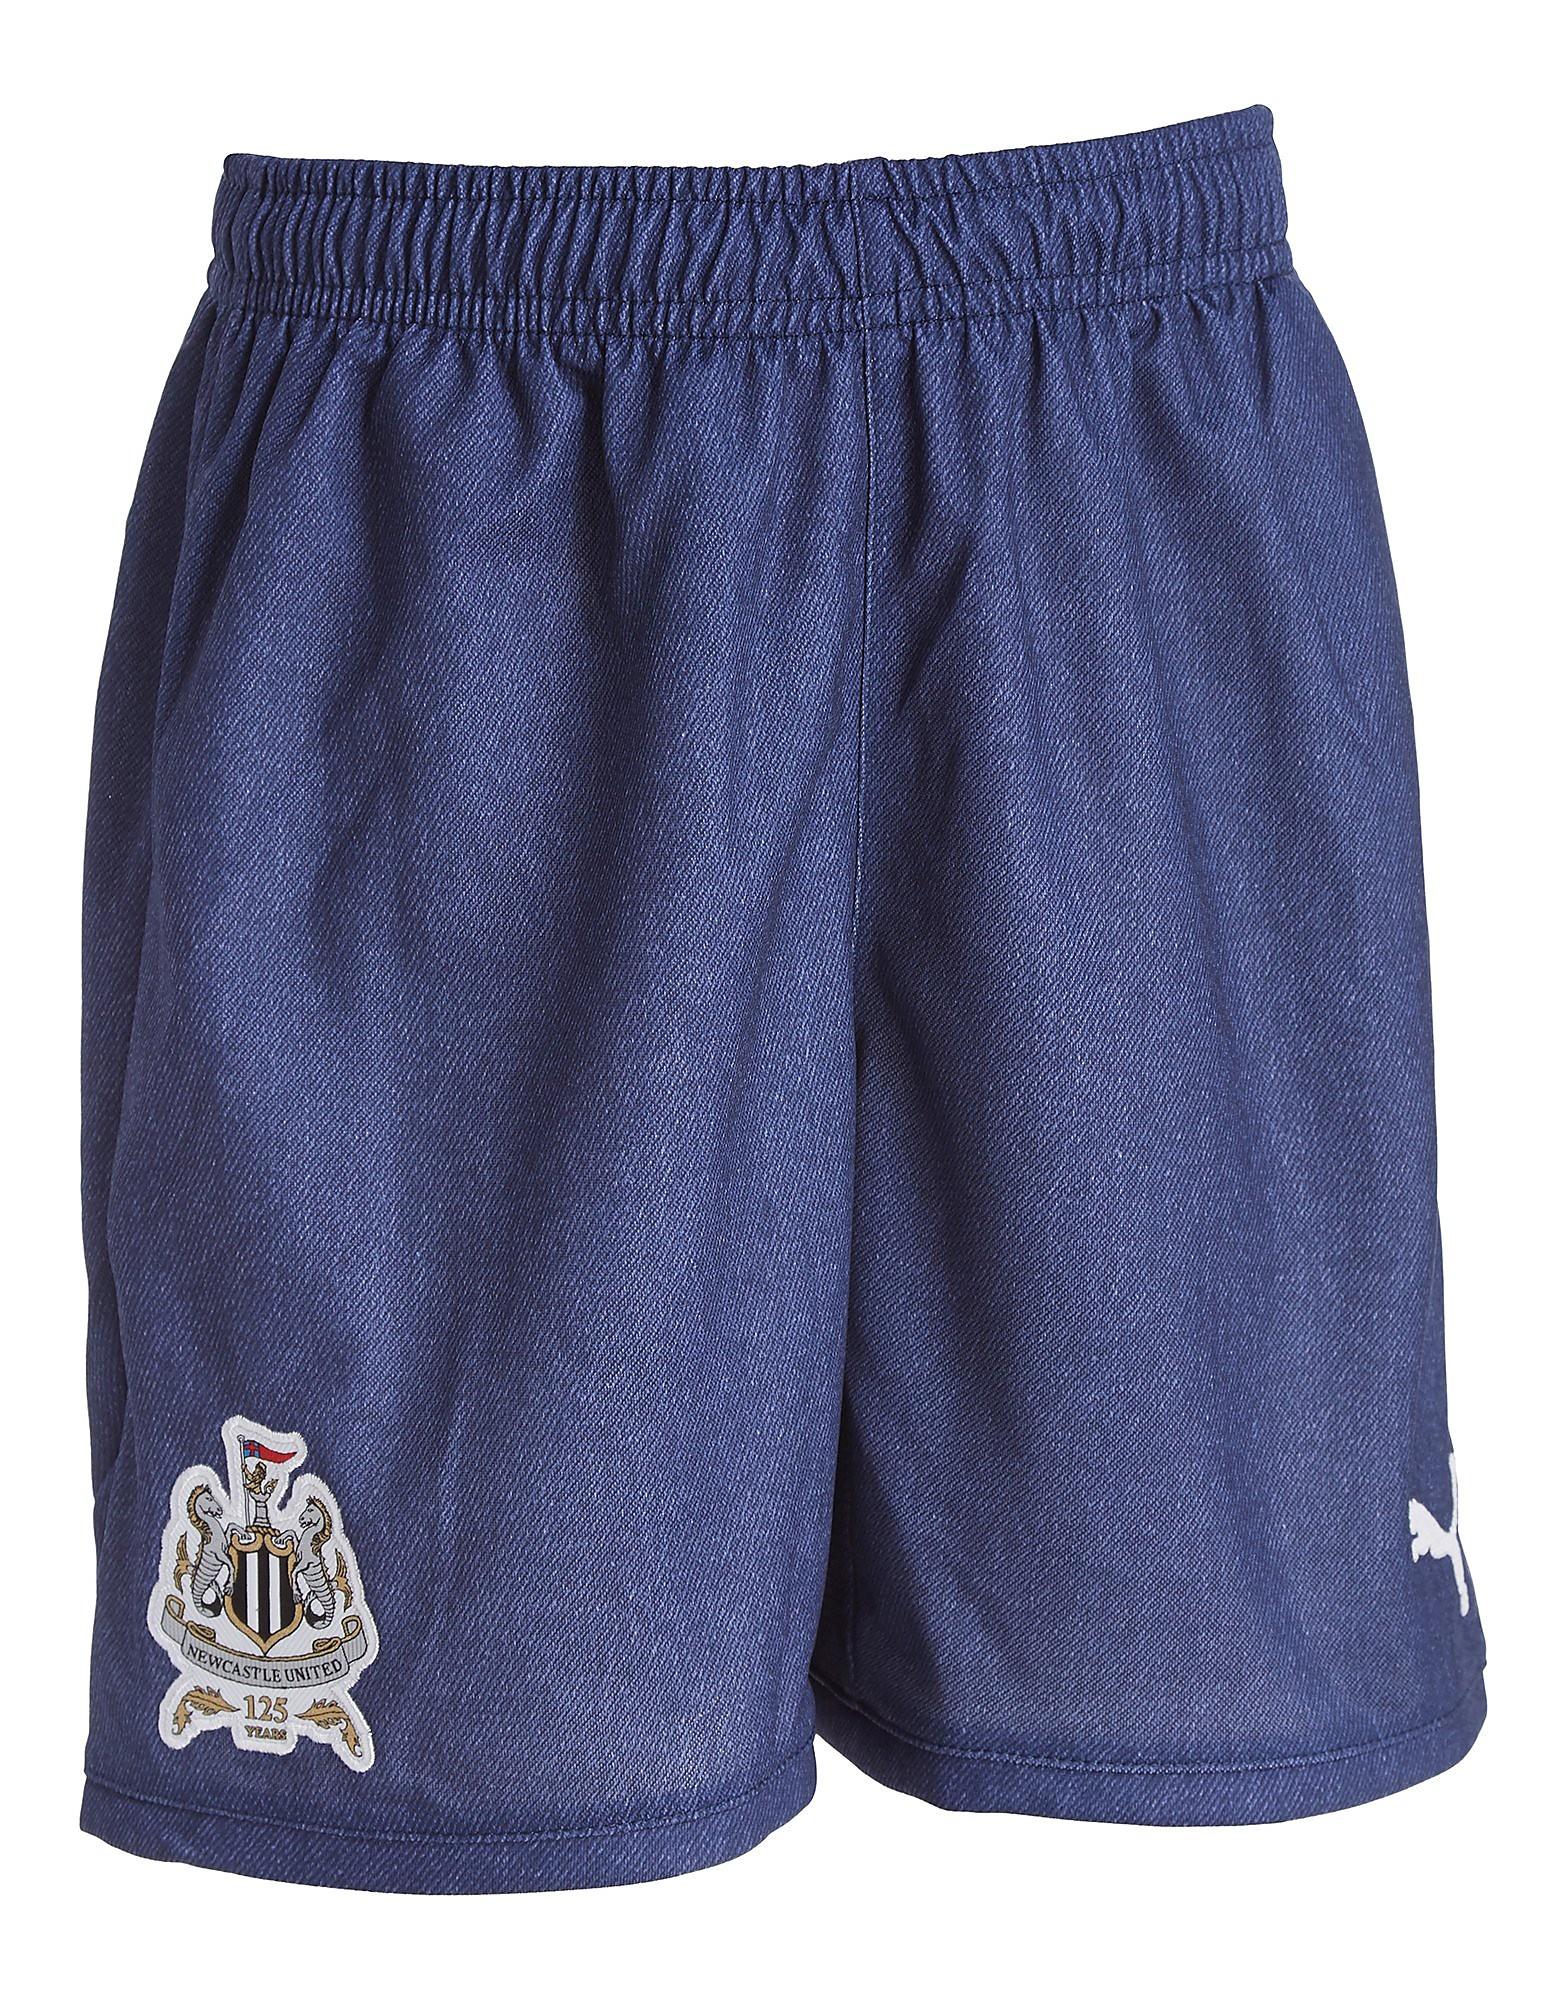 PUMA Newcastle United 2017/18 Away Shorts Junior